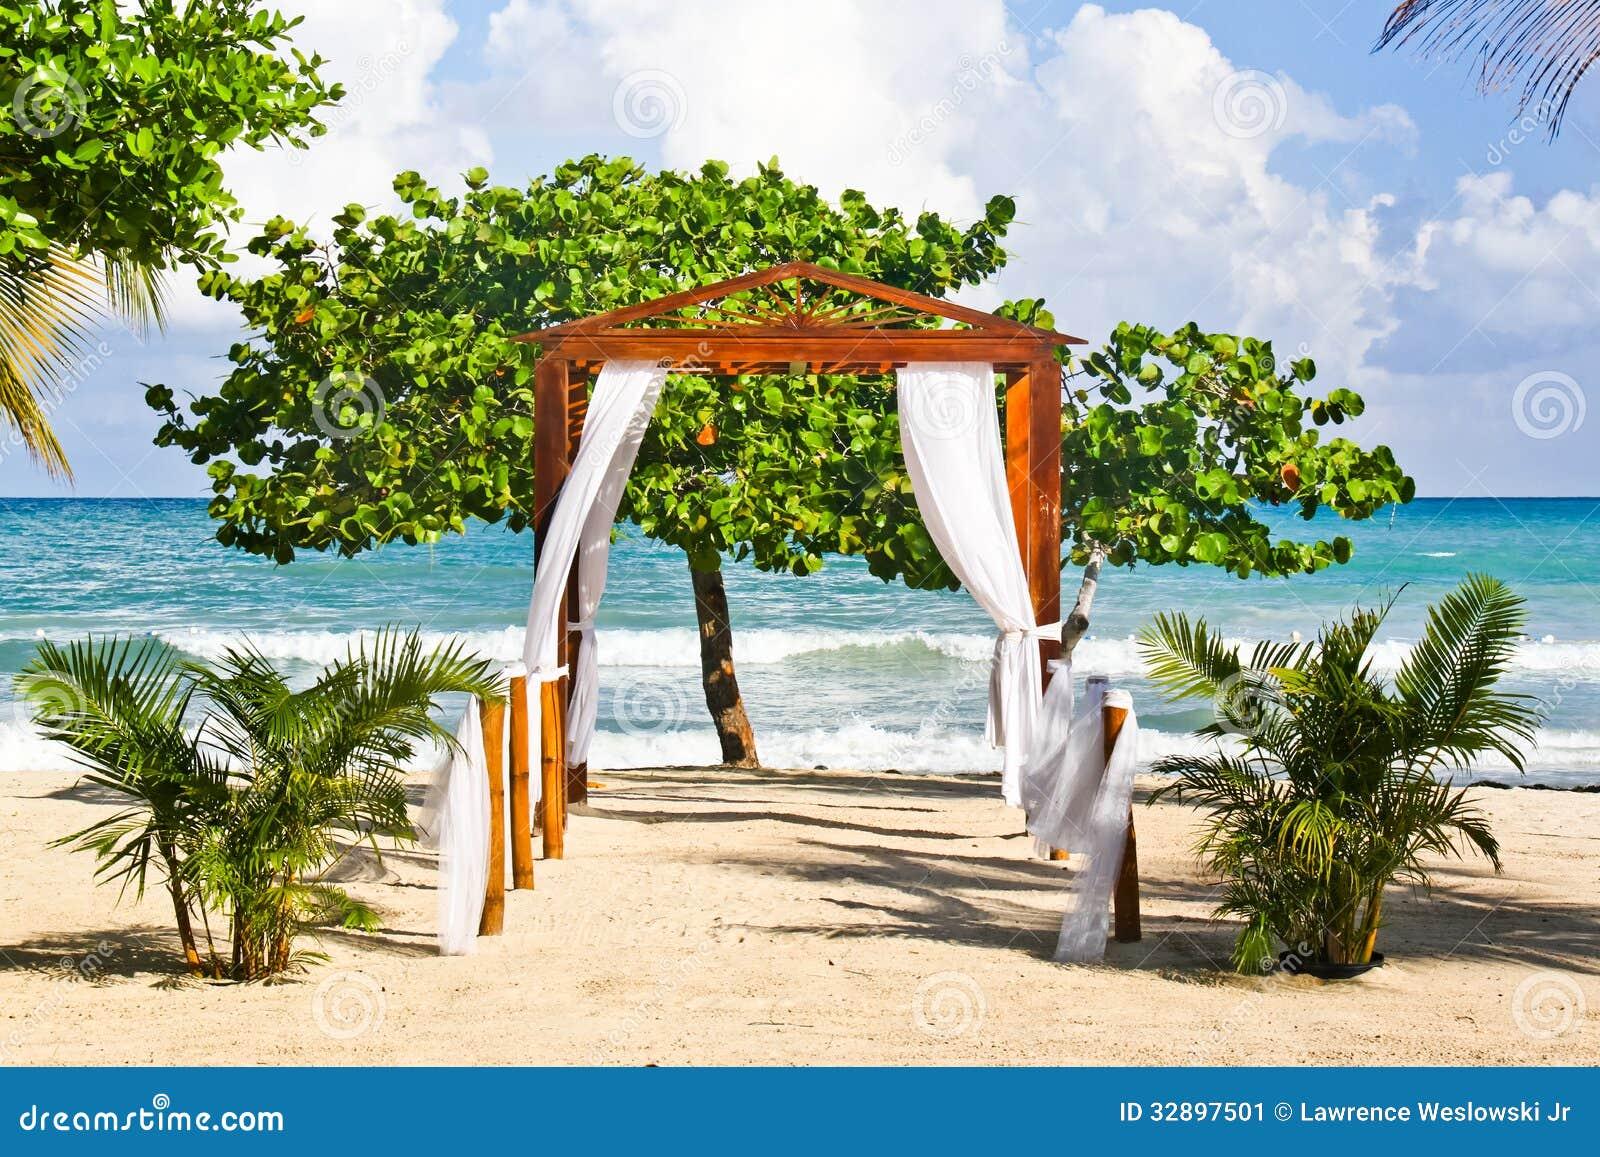 Romantic Beach Wedding Spot In Jamaica Stock Image